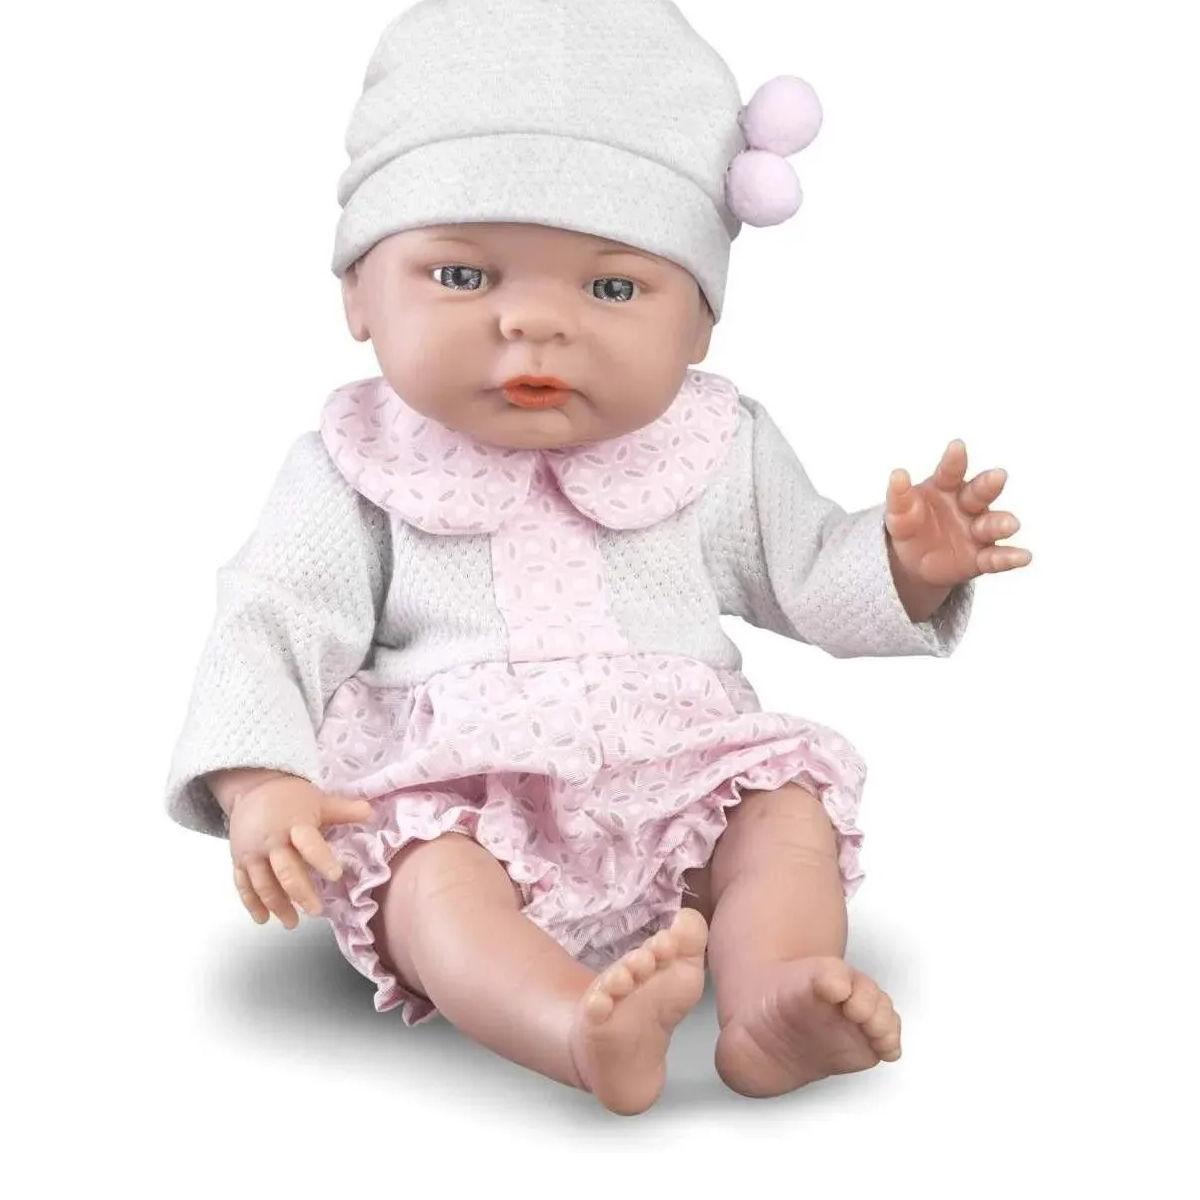 Boneca Babies Hora da Vacina Estilo Reborn Com Acessórios 5069